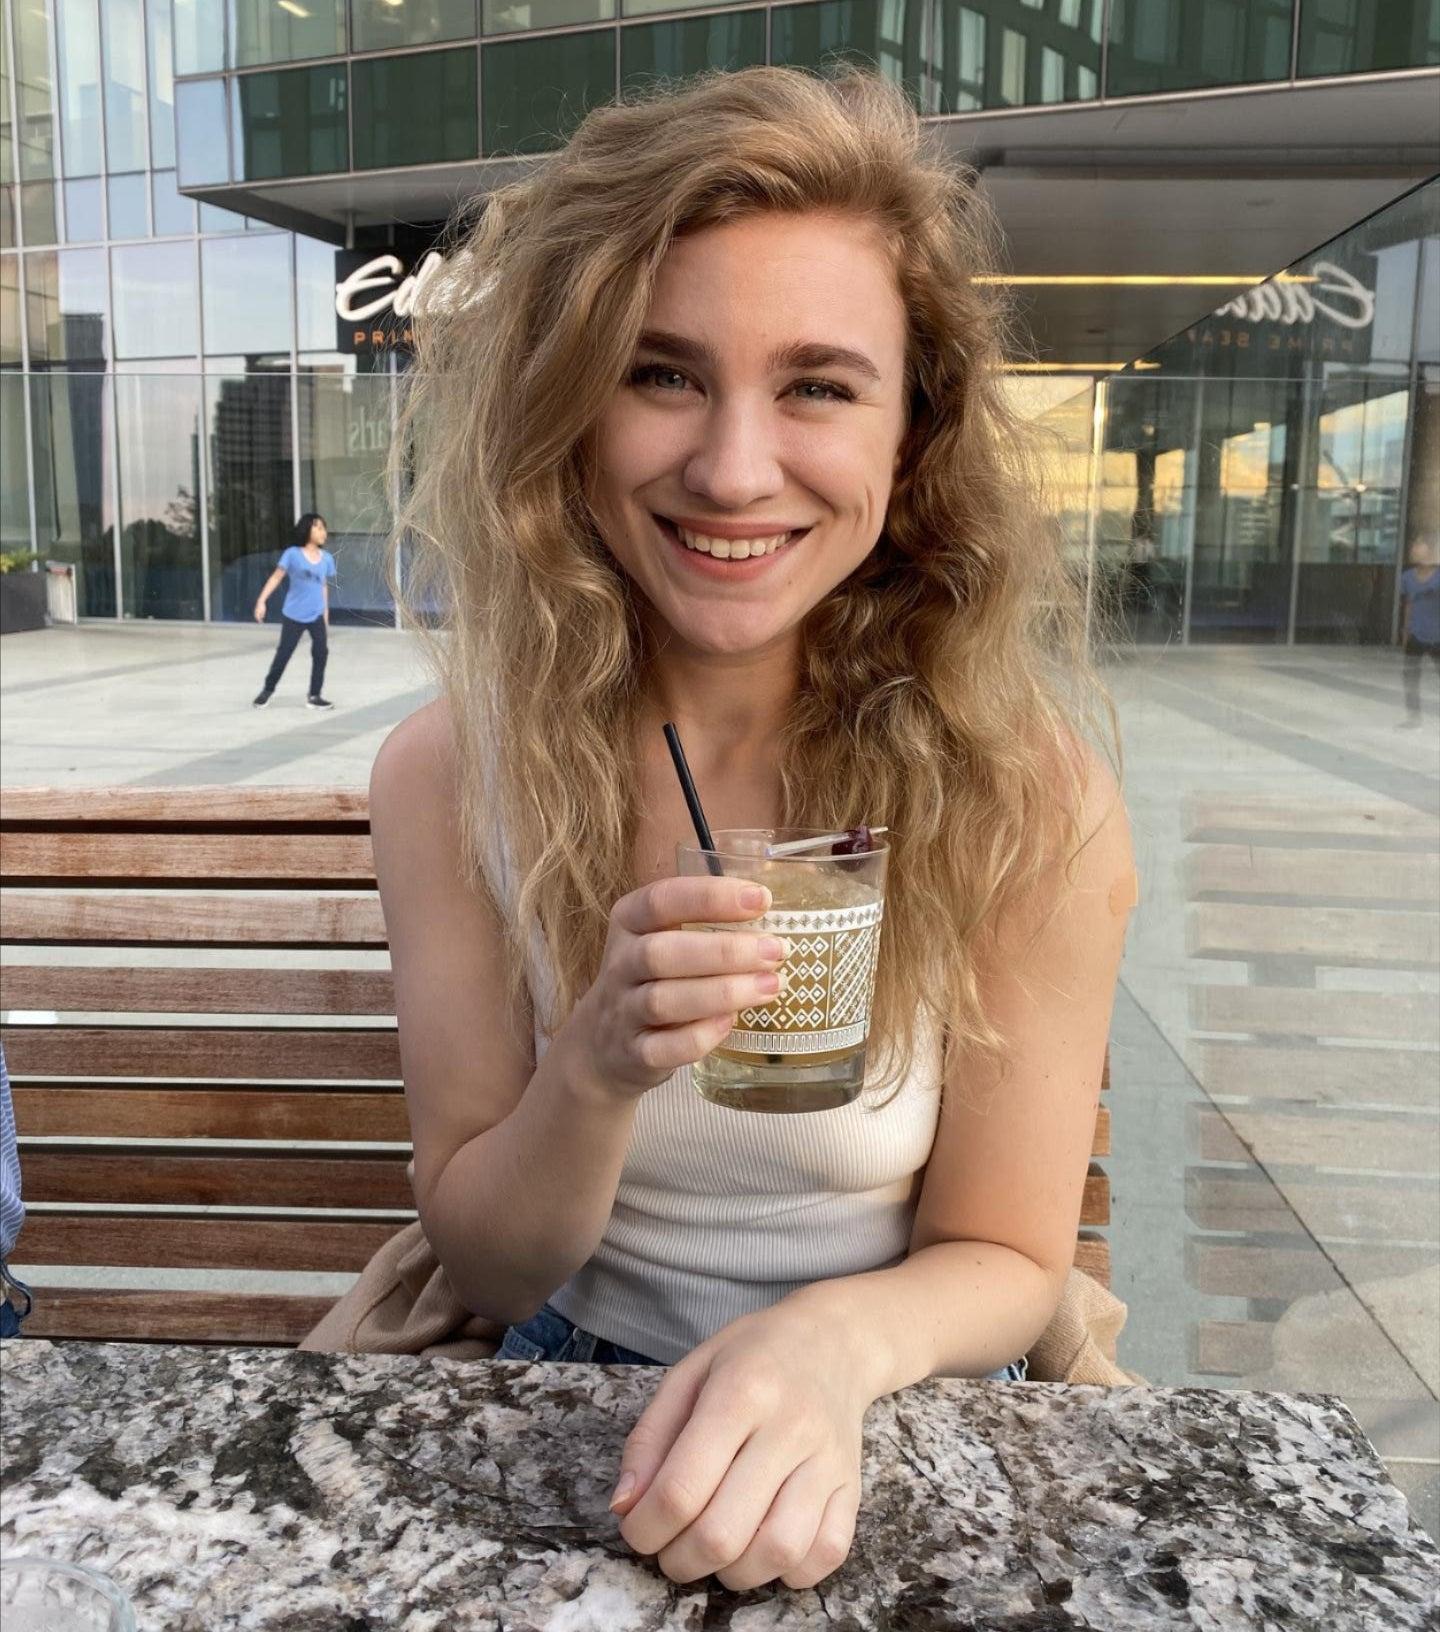 emma holding a drink